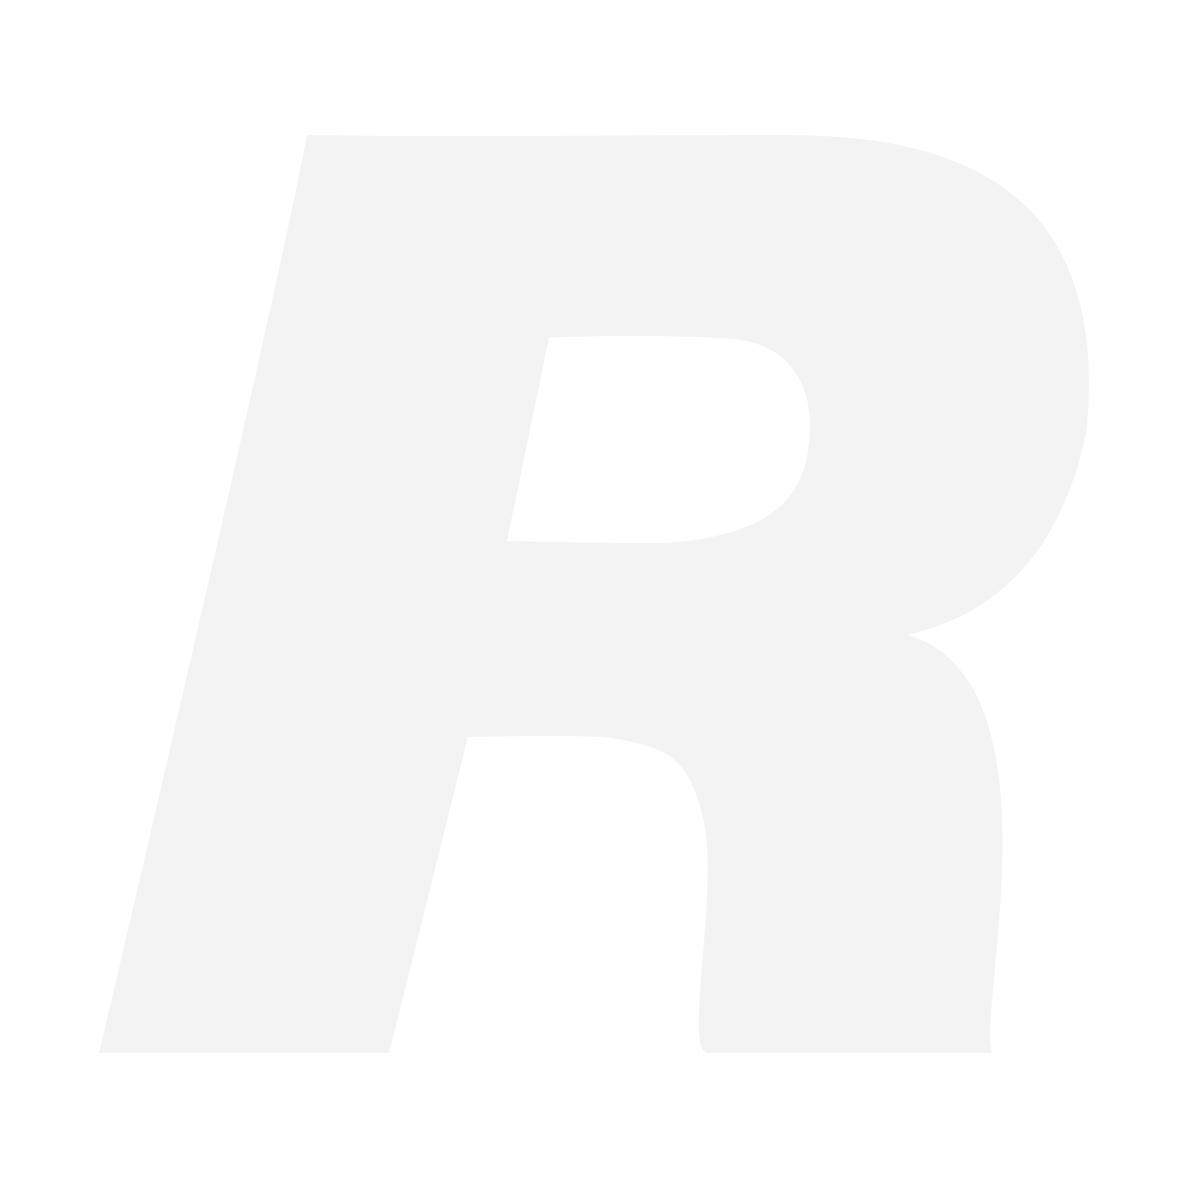 Sony CyberShot DSC-RX100 IV (2,9x optisk zoom)